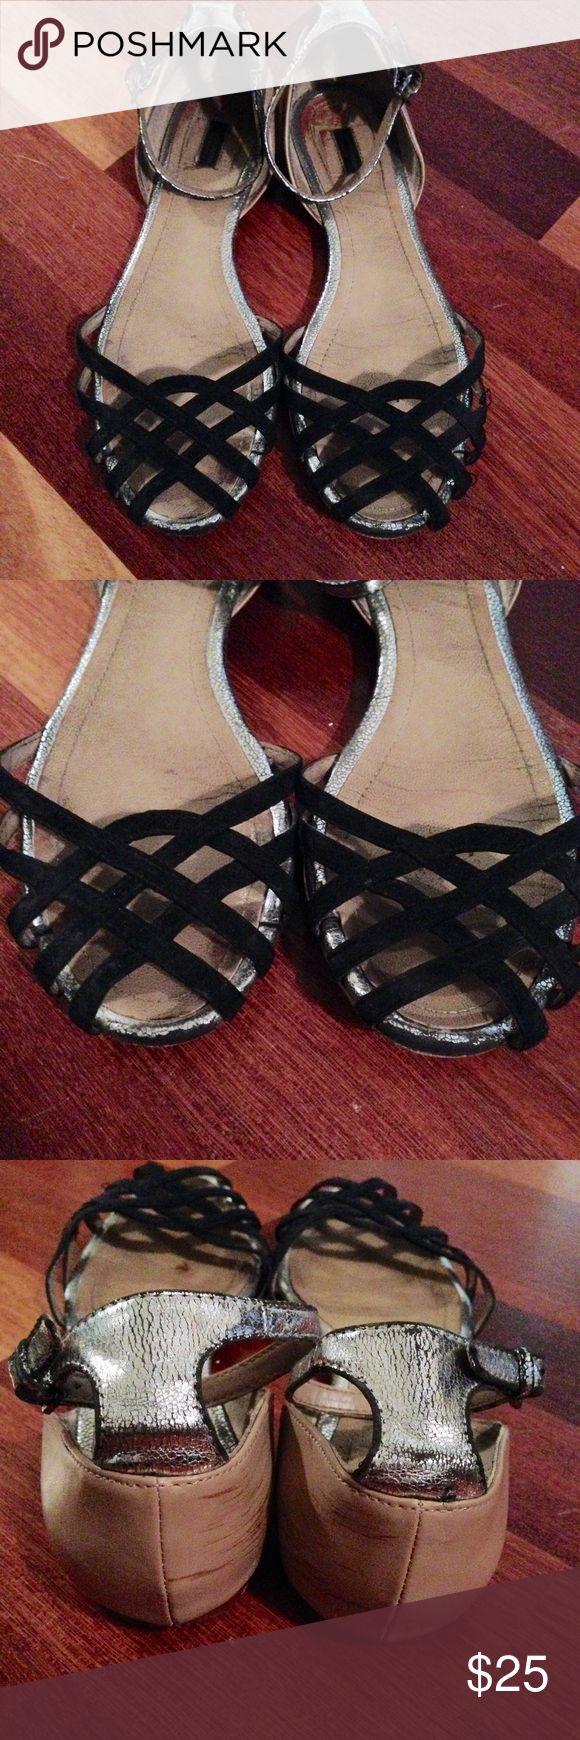 ZARA Black and Silver flat sandals Zara Black and Silver flat Sandals with ankle fastening. Zara Shoes Sandals